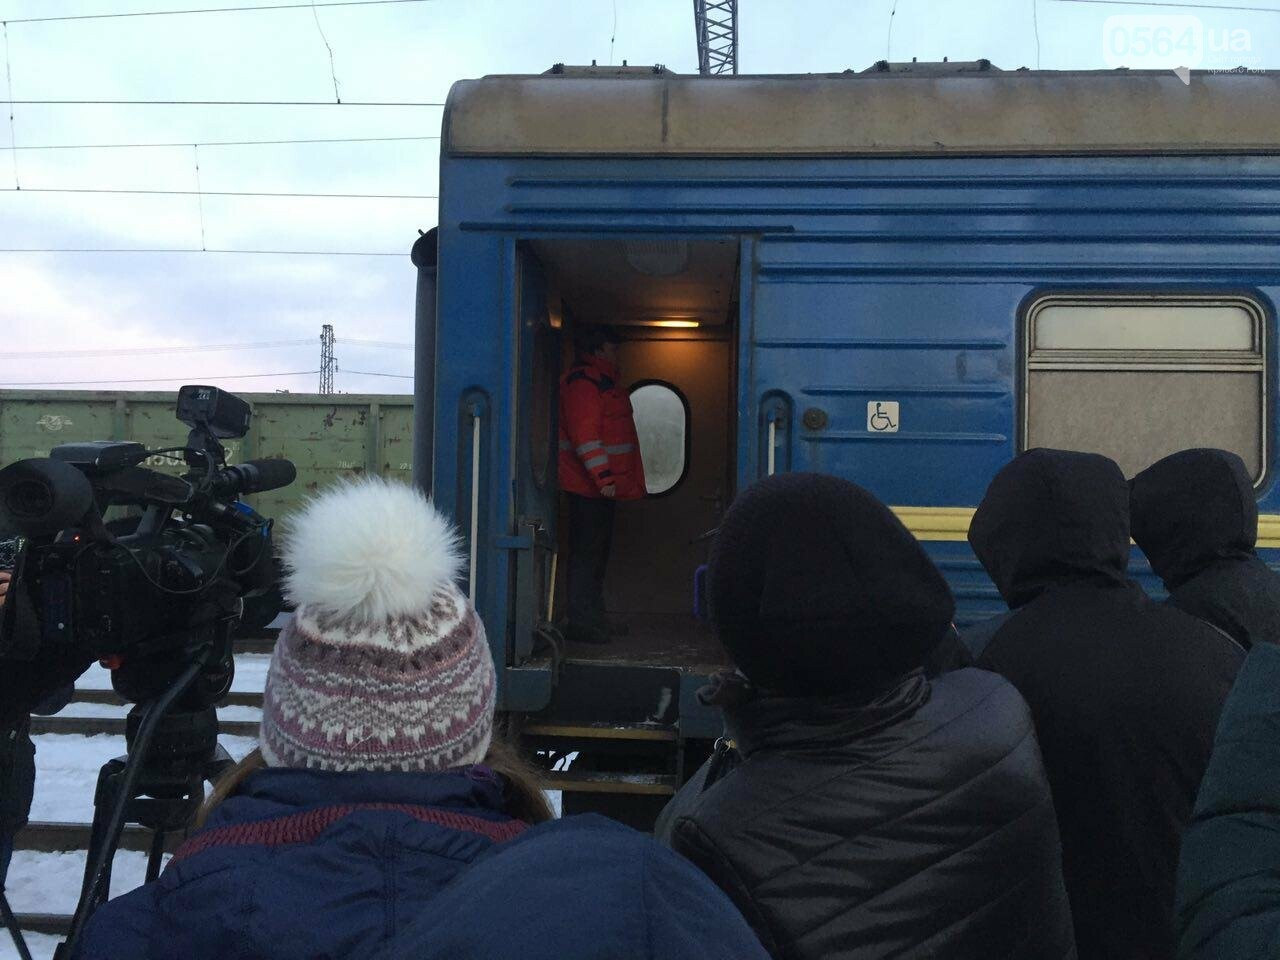 В Кривой Рог вернулся журналист Вячеслав Волк, тяжело раненый во время учений резервистов (ФОТО), фото-2